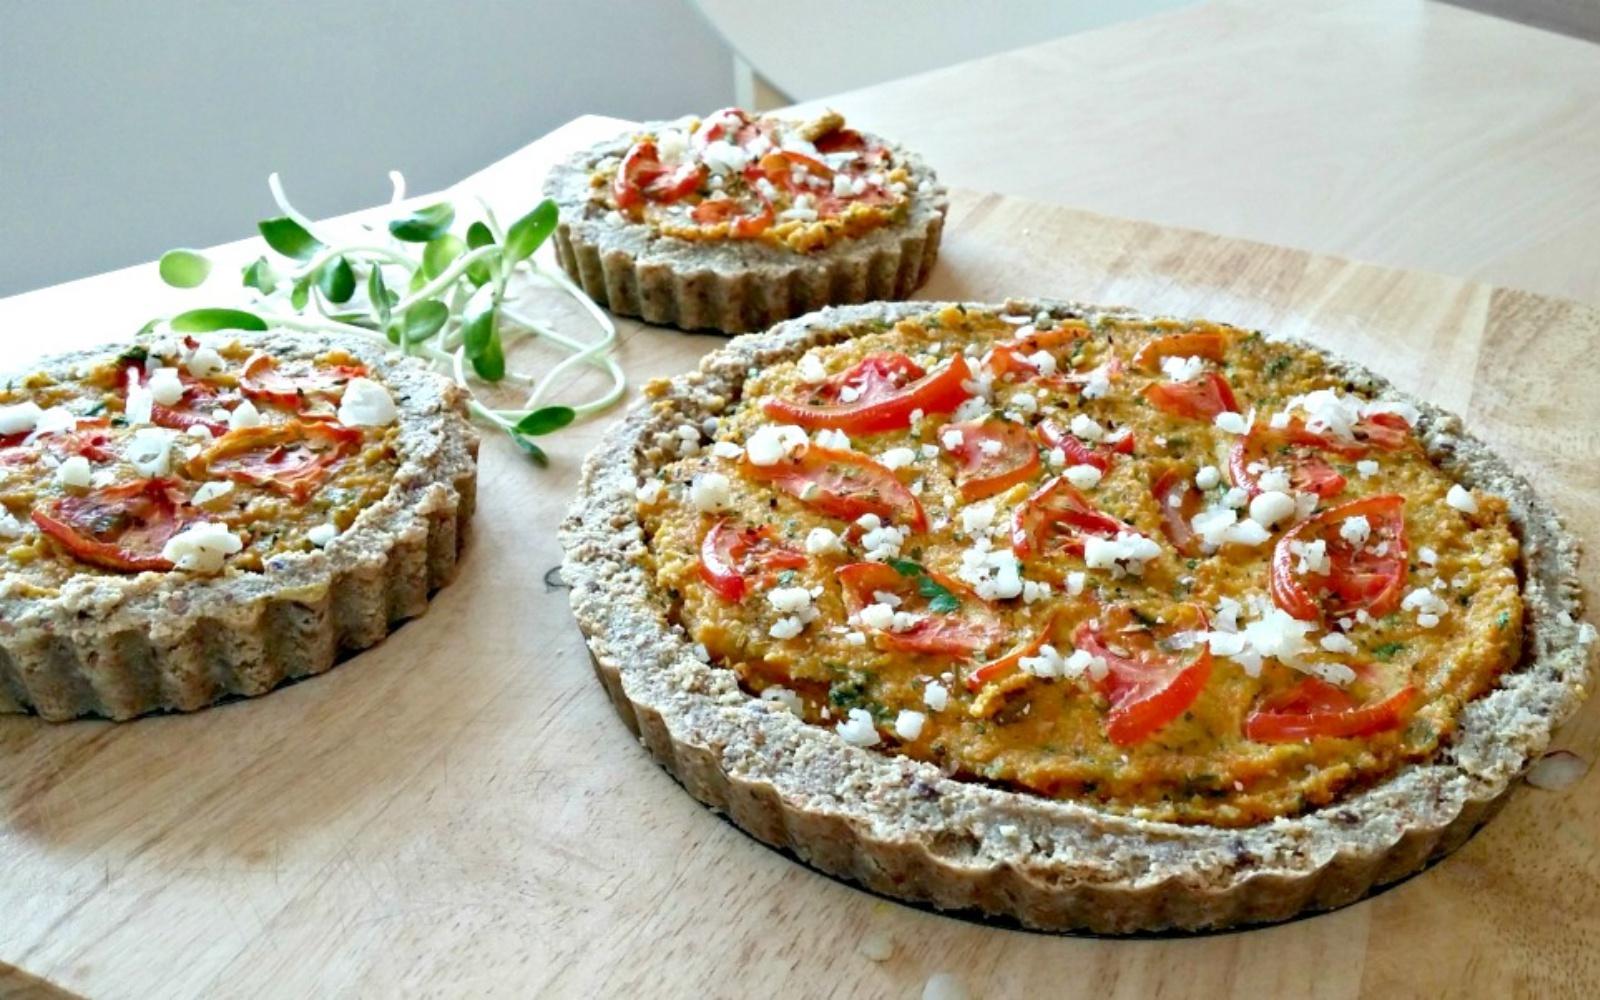 Tomato & Parsley vegan Quiche